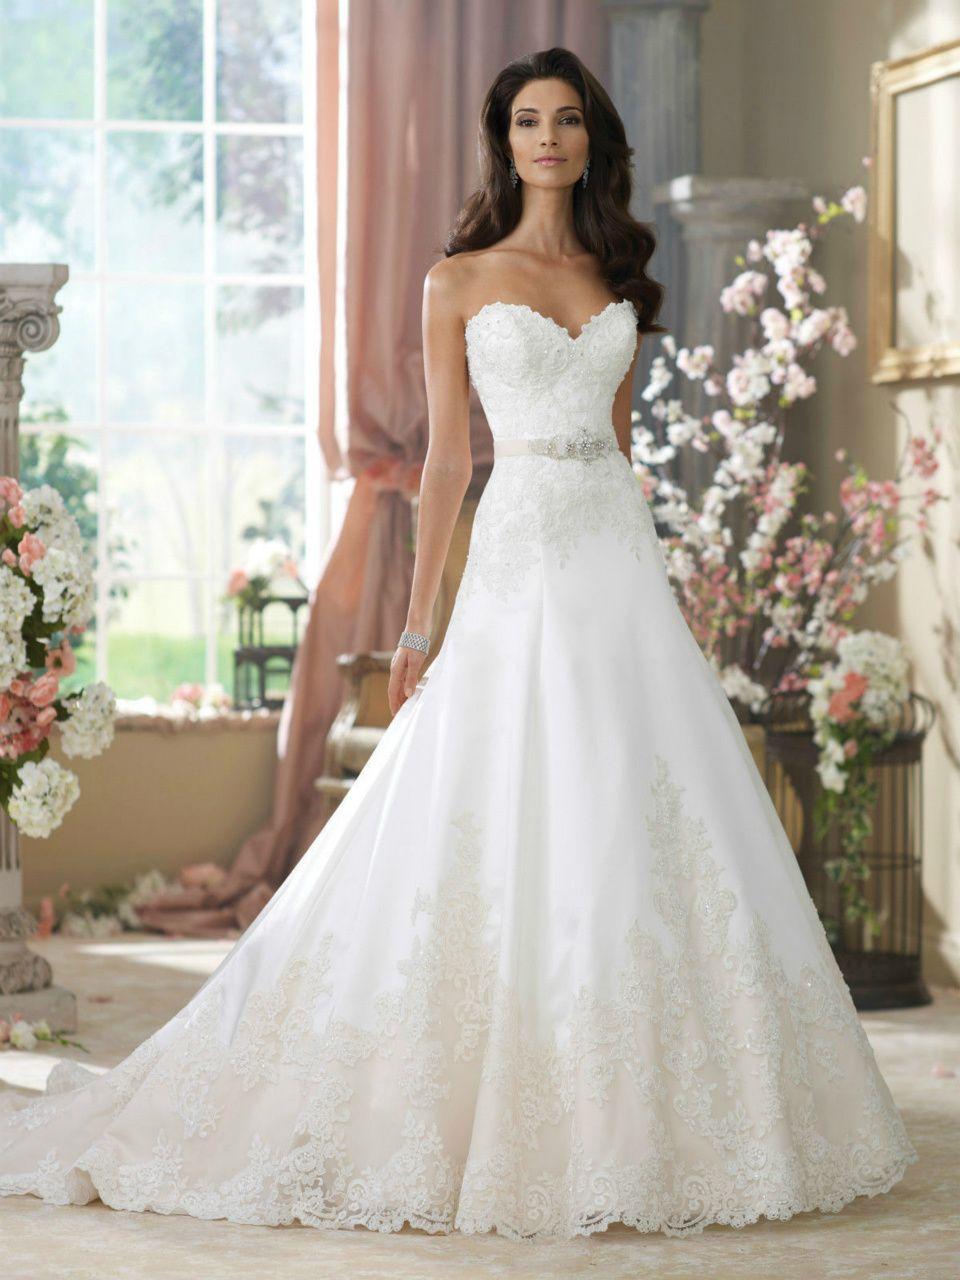 Brudekjoler 2015 densmukkekjole june kr 5295 best a line wedding dresses wedding gowns by david tutera for mon cheri fall 2014 ombrellifo Images